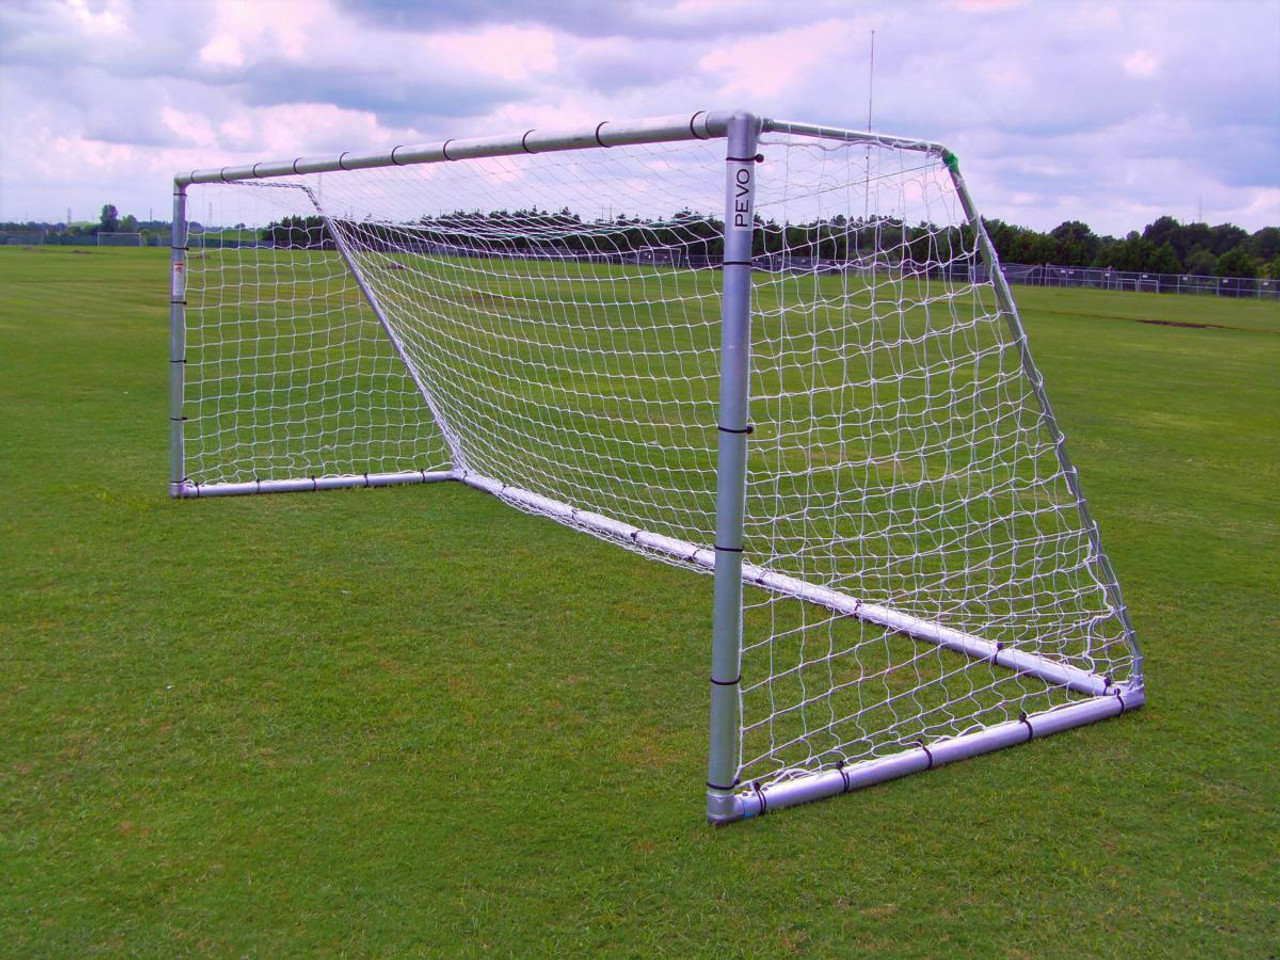 "Pevo Economy Series 3"" Round Soccer Goals (pair)"